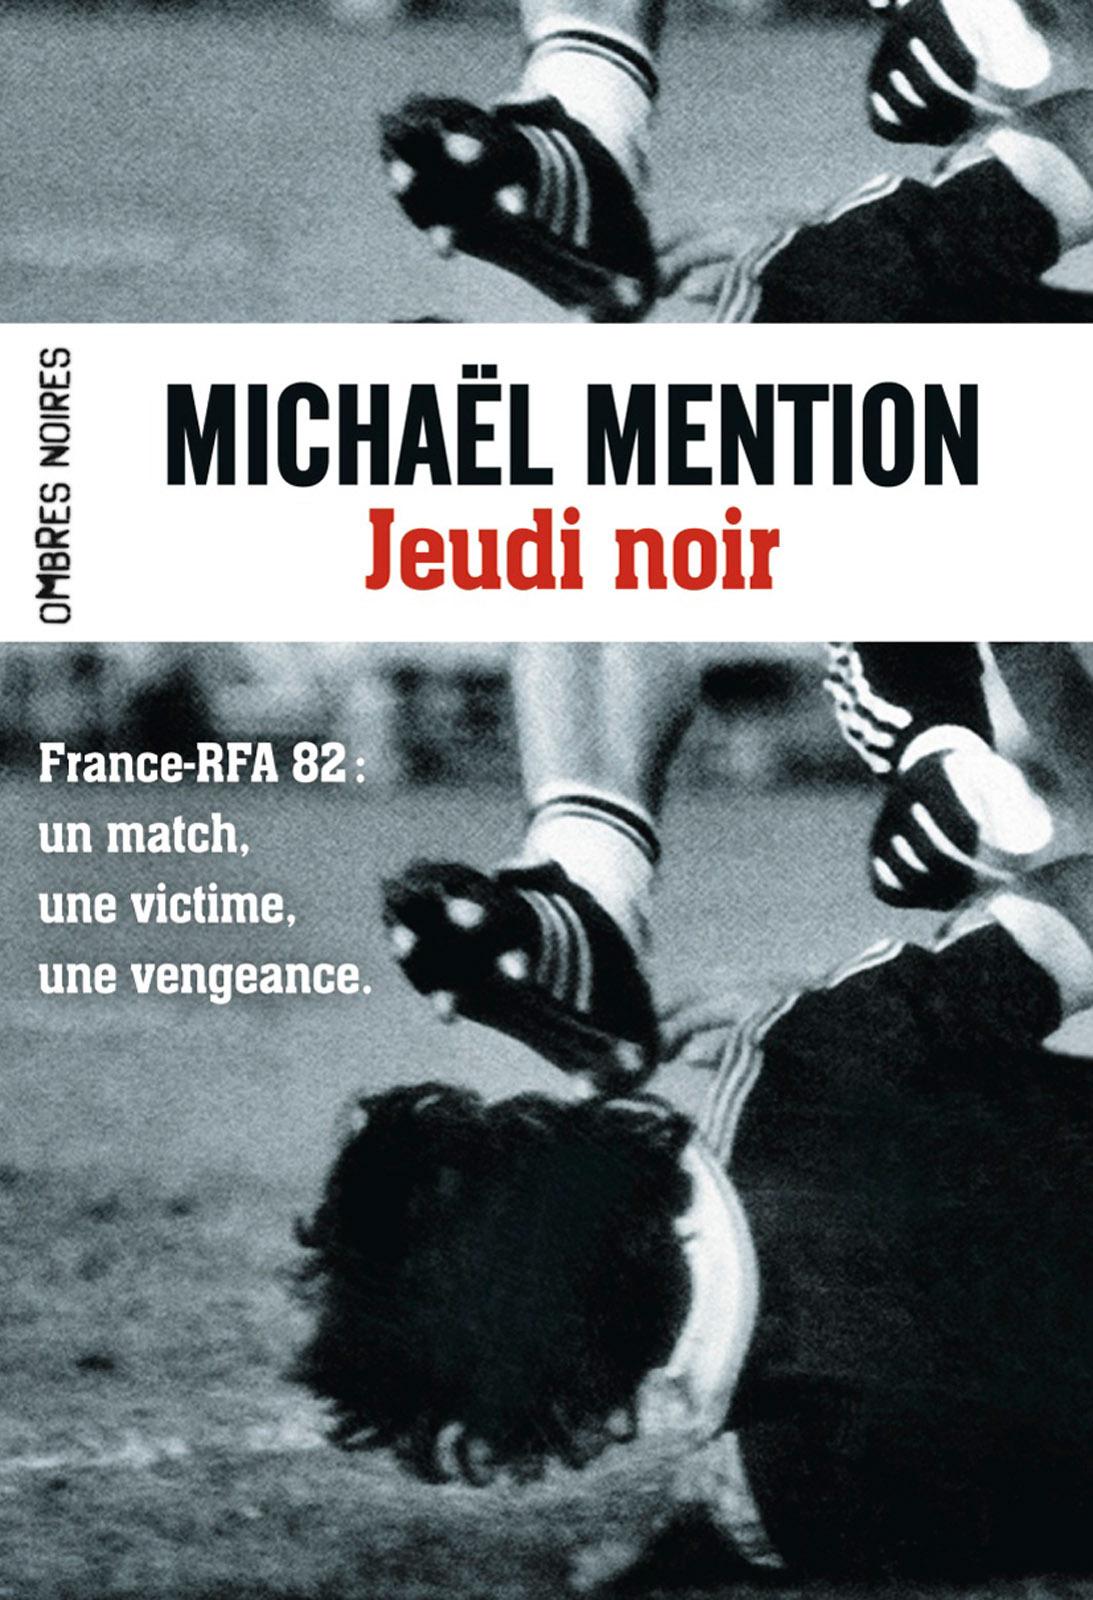 Jeudi noir (France - R.F.A. 82)